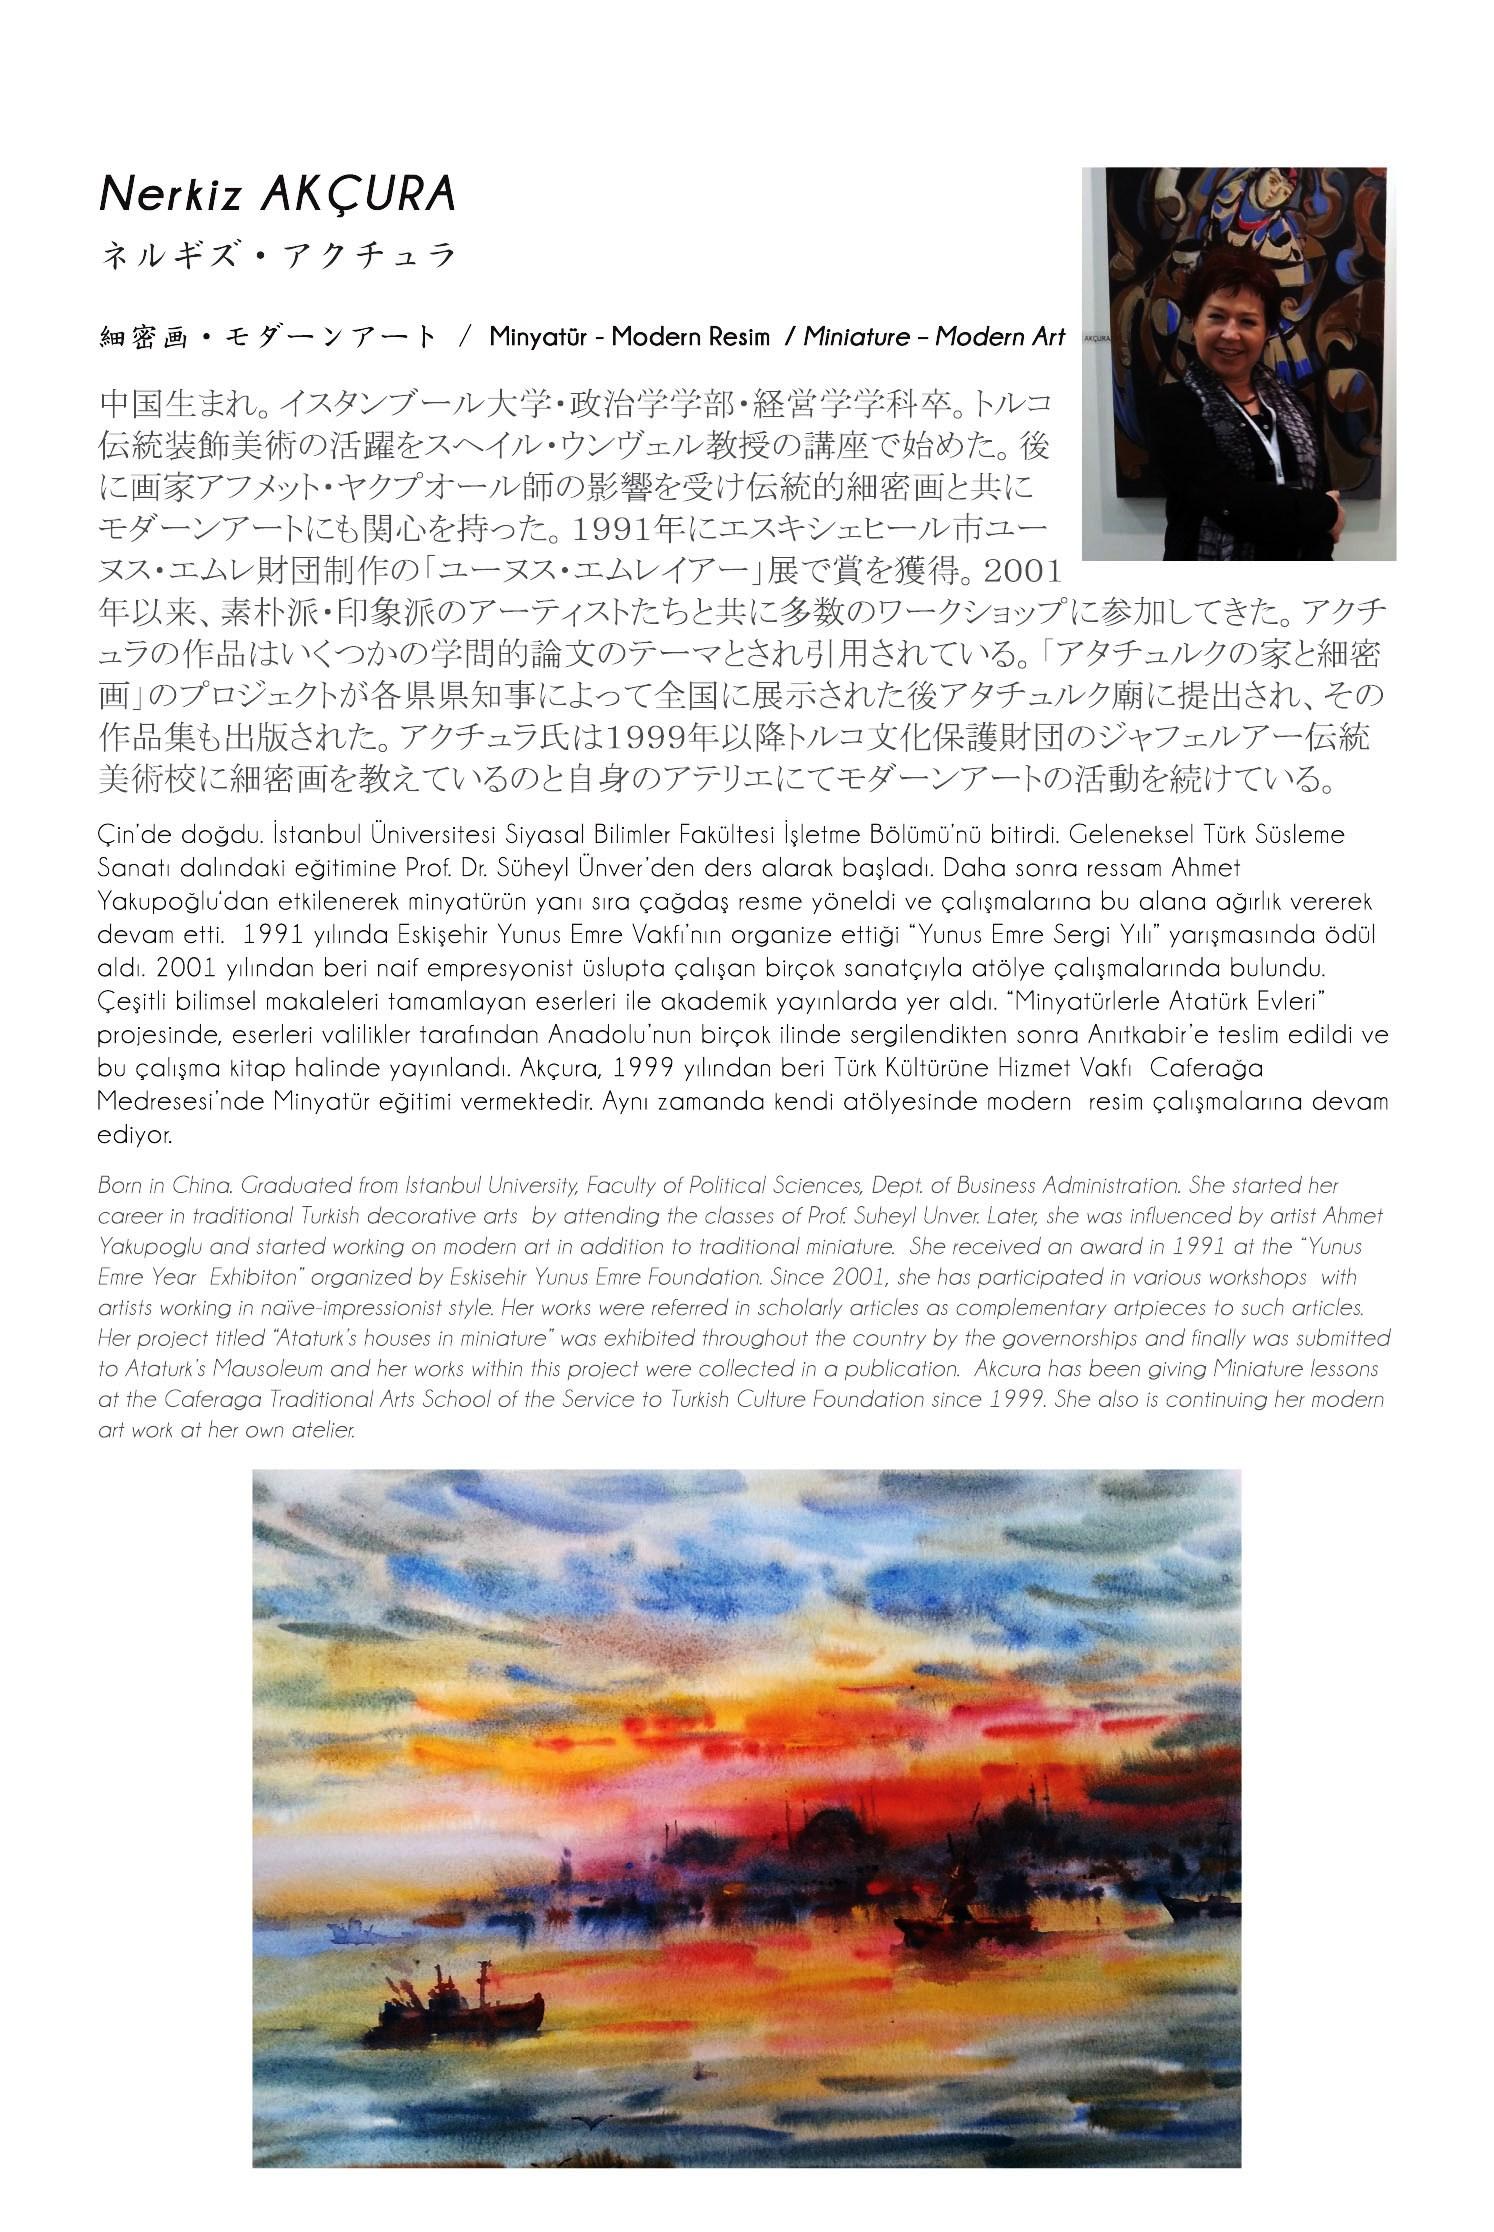 82_artturkey_japan_nerkiz_akcura